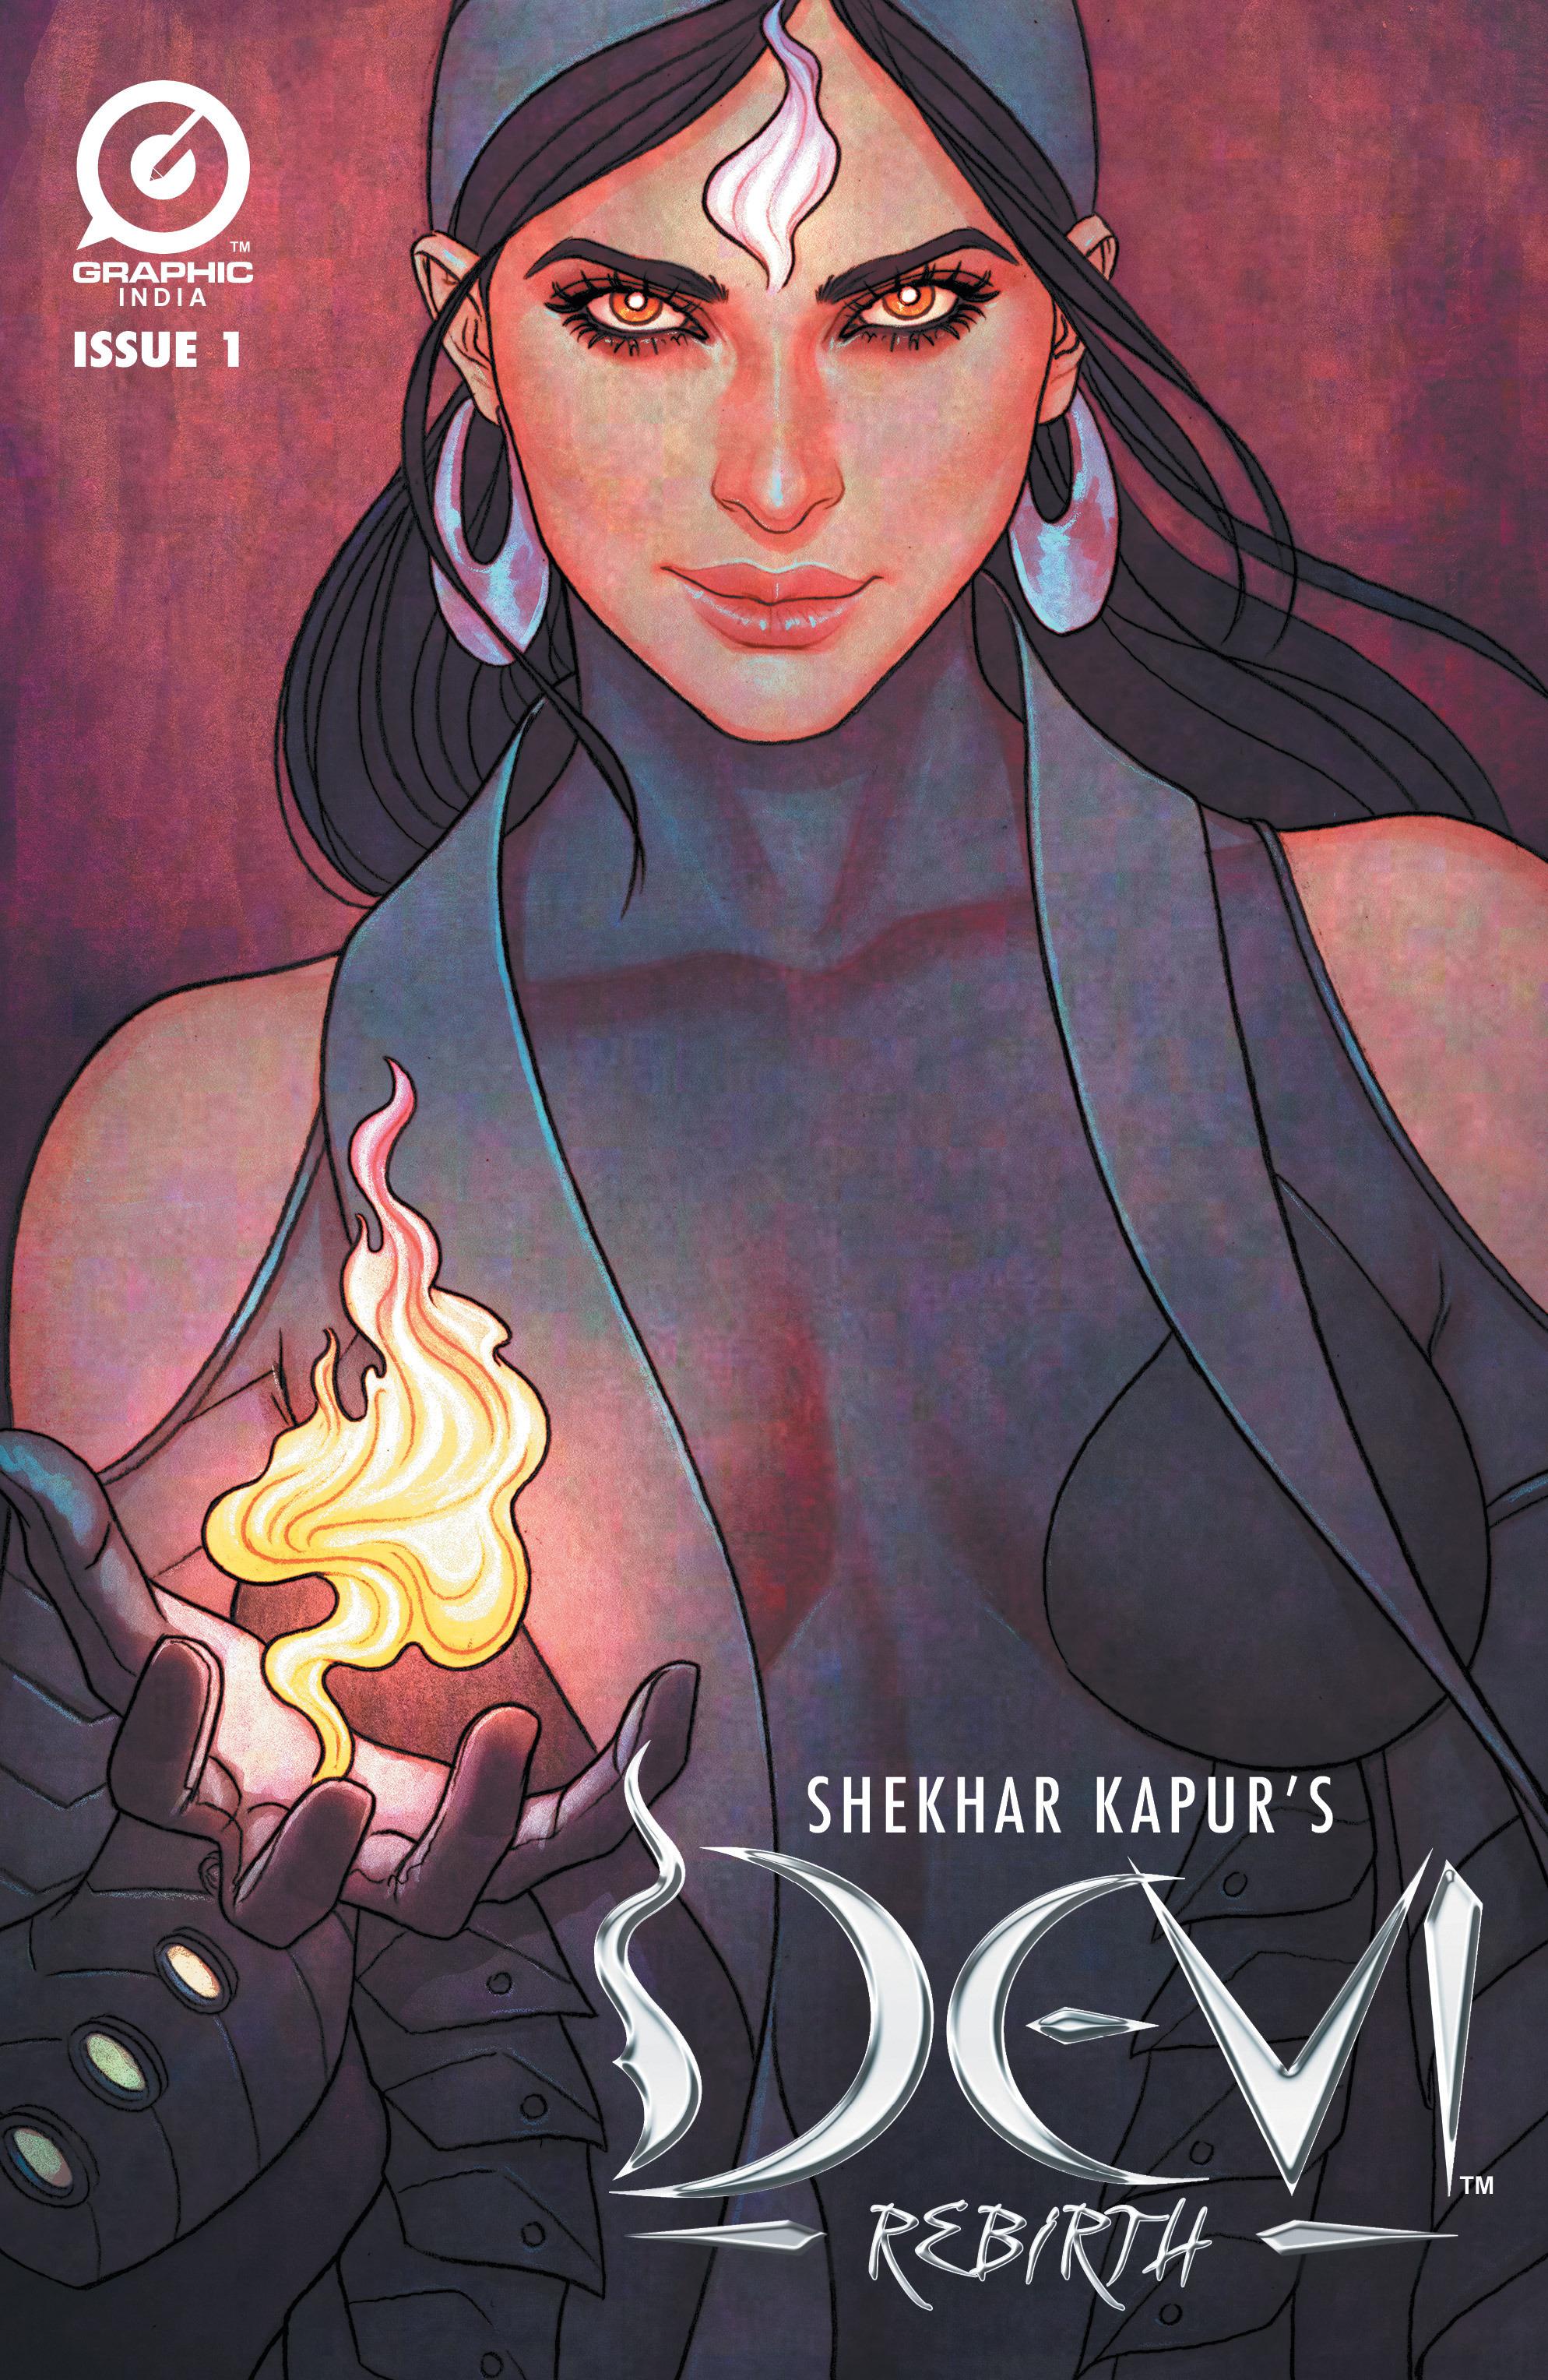 Read online Shekhar Kapur's Devi: Rebirth comic -  Issue #1 - 1